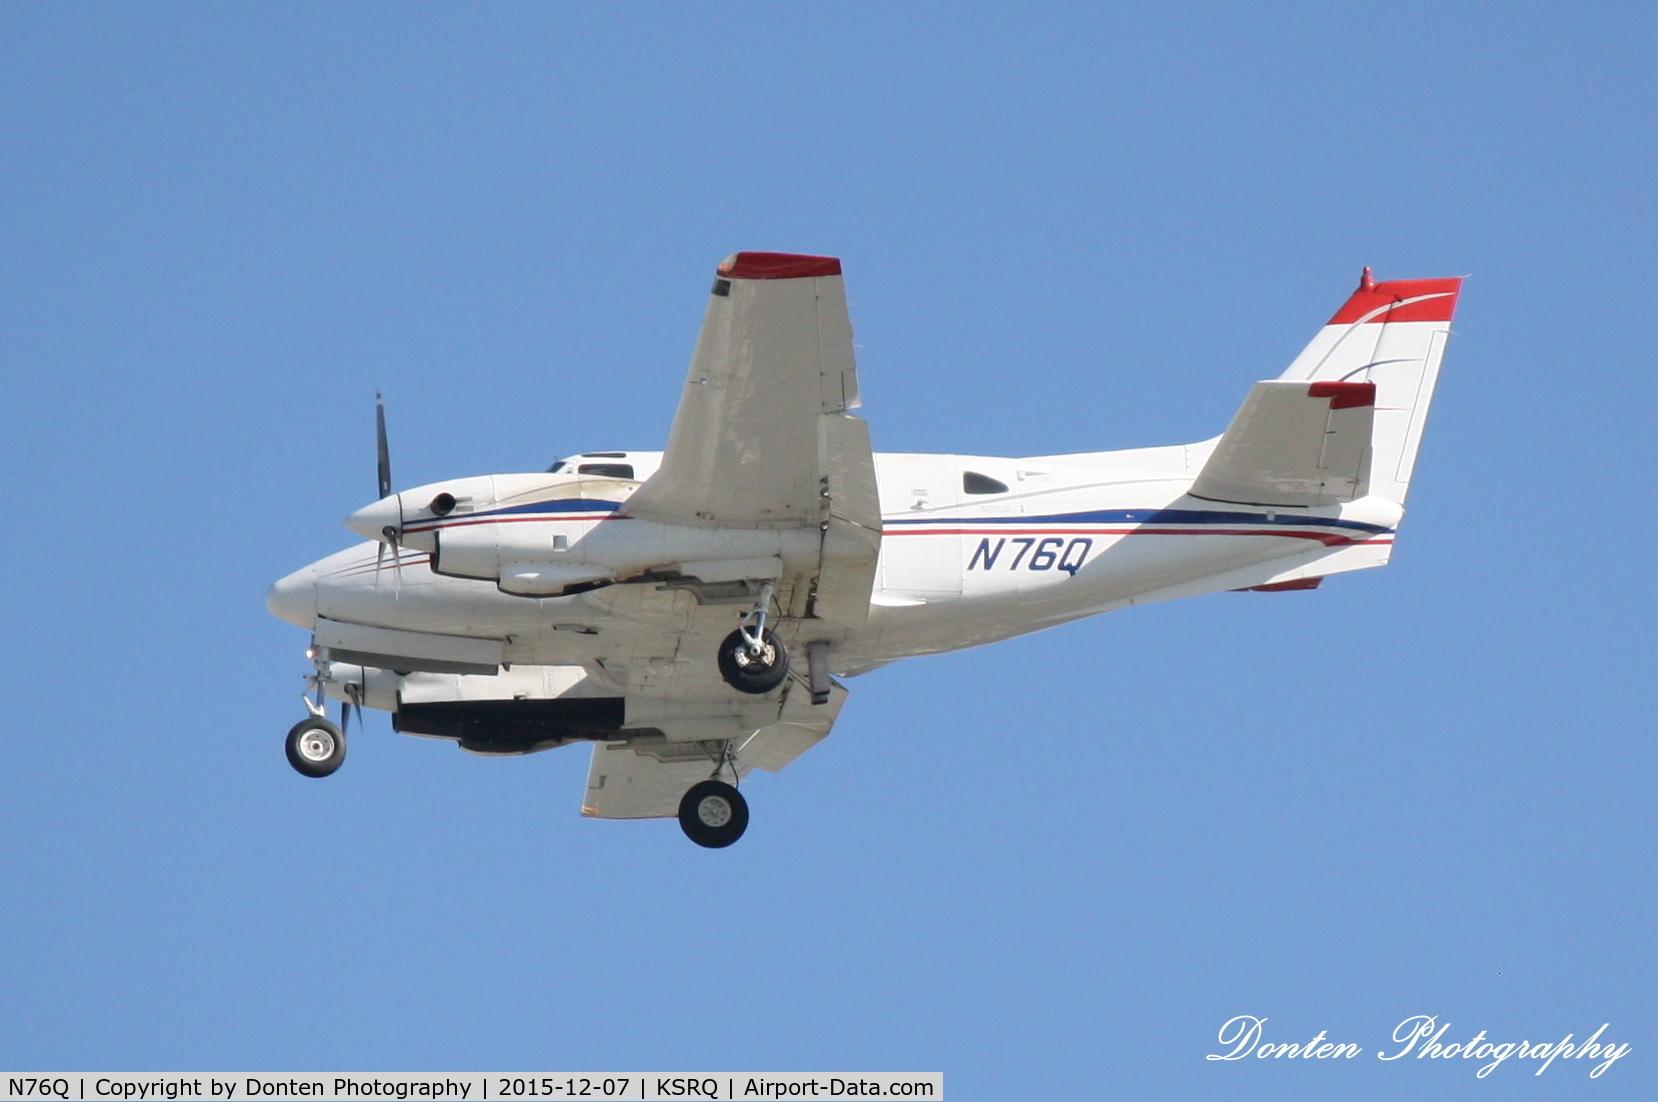 N76Q, 1967 Beech U-21A Ute C/N LM-15, Beechcraft King Air 90 (N76Q) arrives at Sarasota-Bradenton International Airport